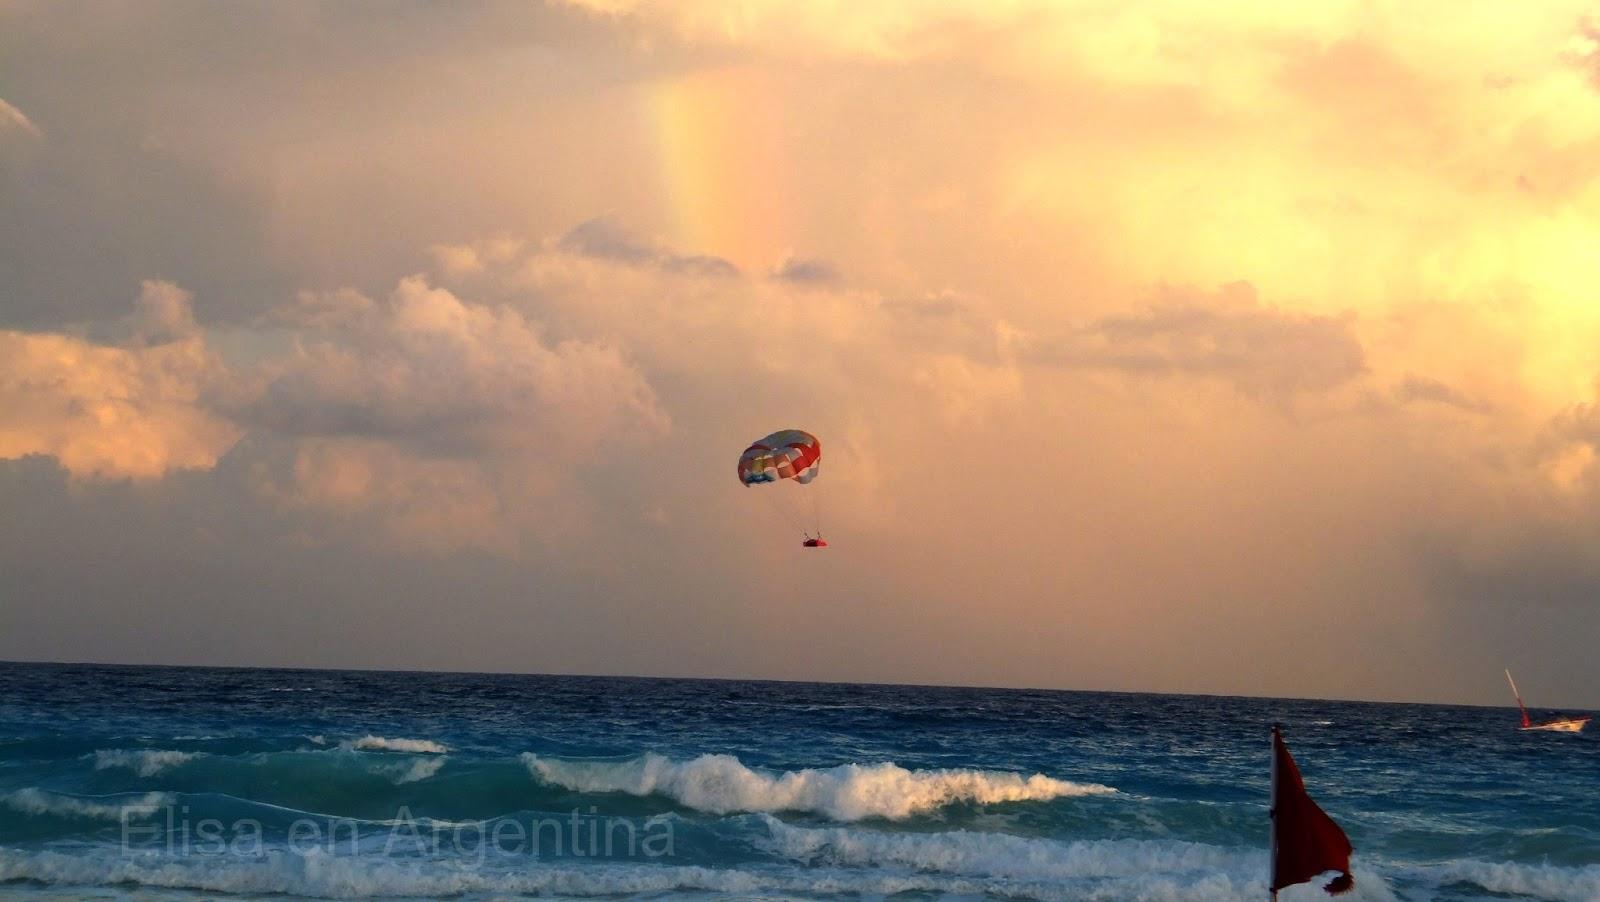 Arco iris sobre el mar, Akumal, México, Riviera Maya, Elisa N, Blog de Viajes, Lifestyle, Travel